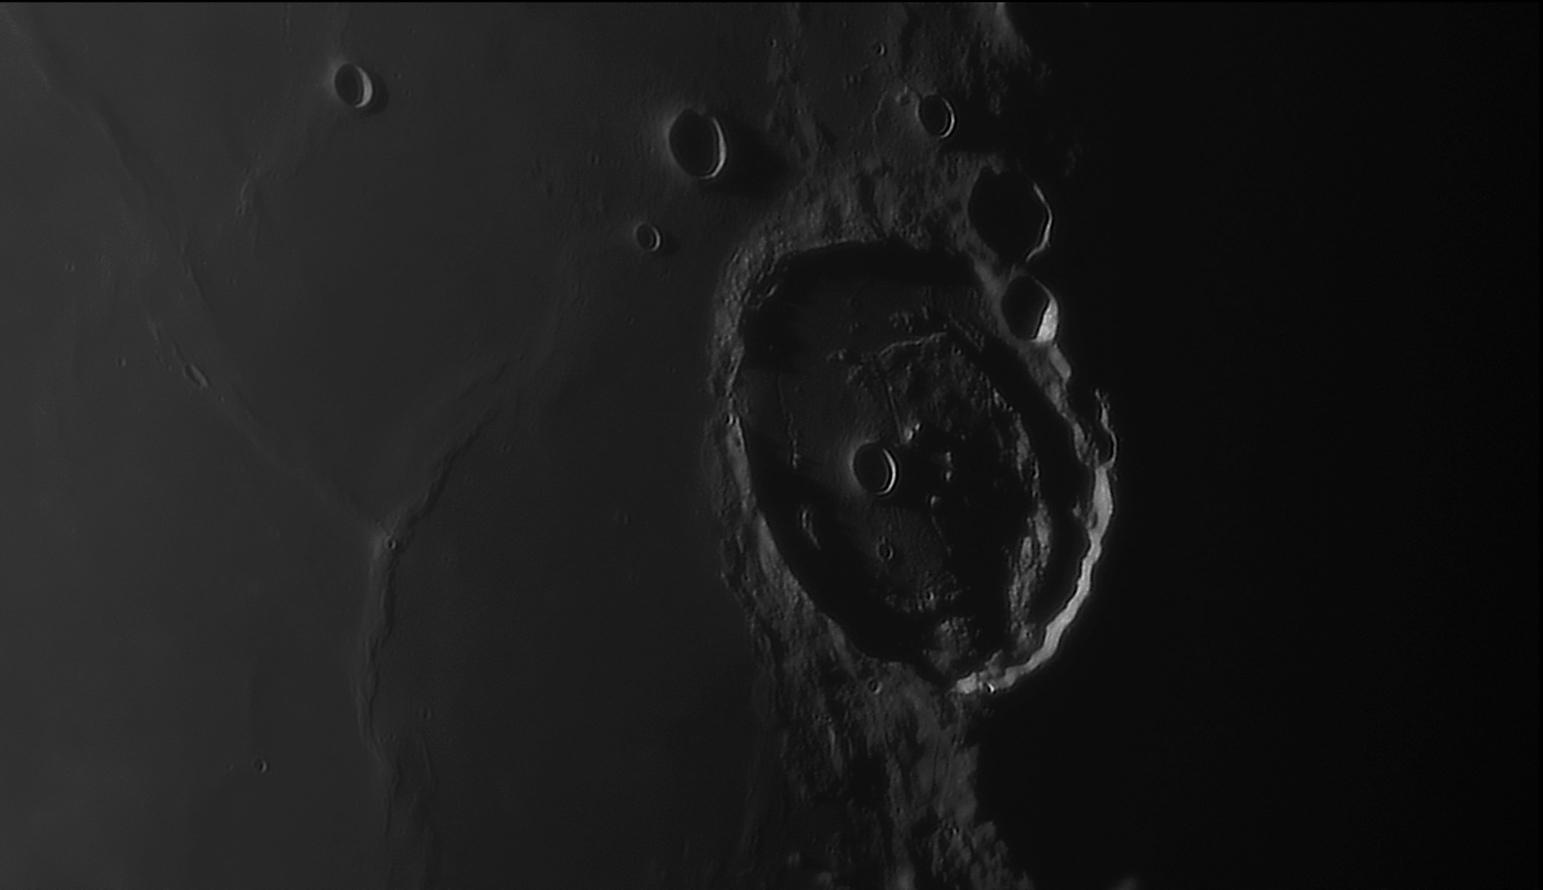 large.moon_19_09_2019_01_44_posid.jpg.d988e5c0a3e04ee151475df7ea60c9d1.jpg